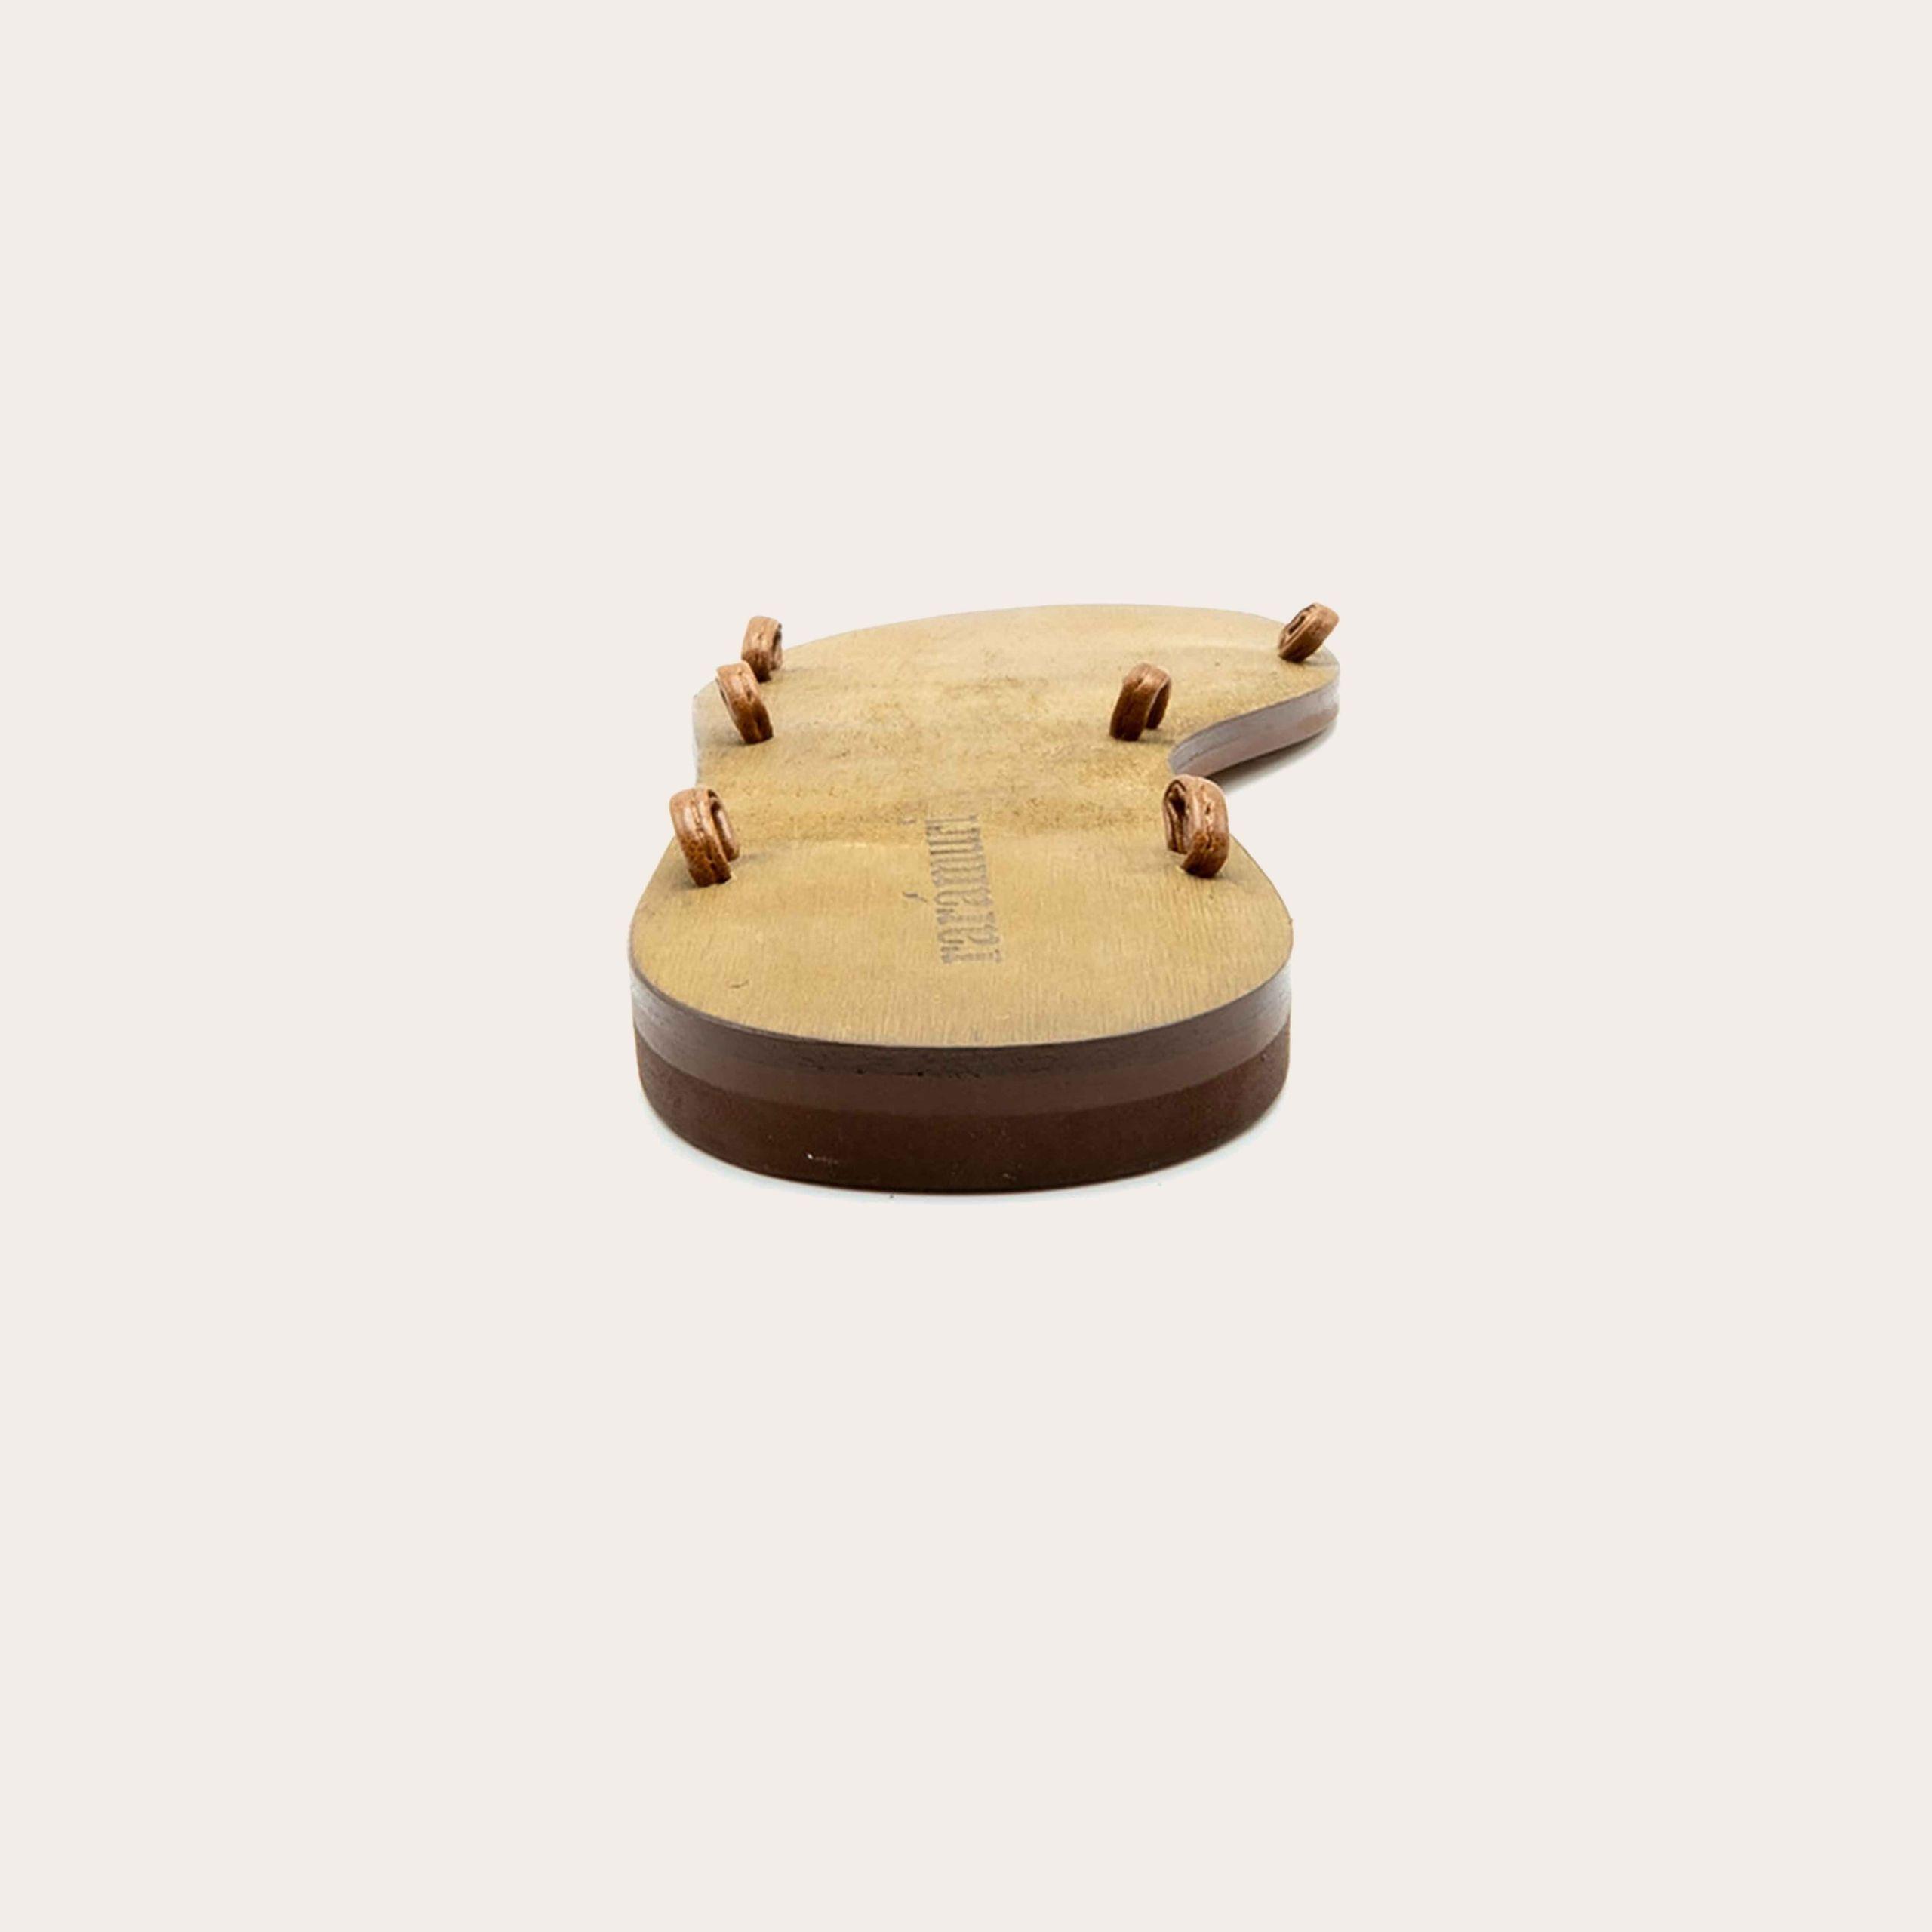 capri-4-lintsandalen sandals travelsandals vegan sustainable sandals wikkelsandalen